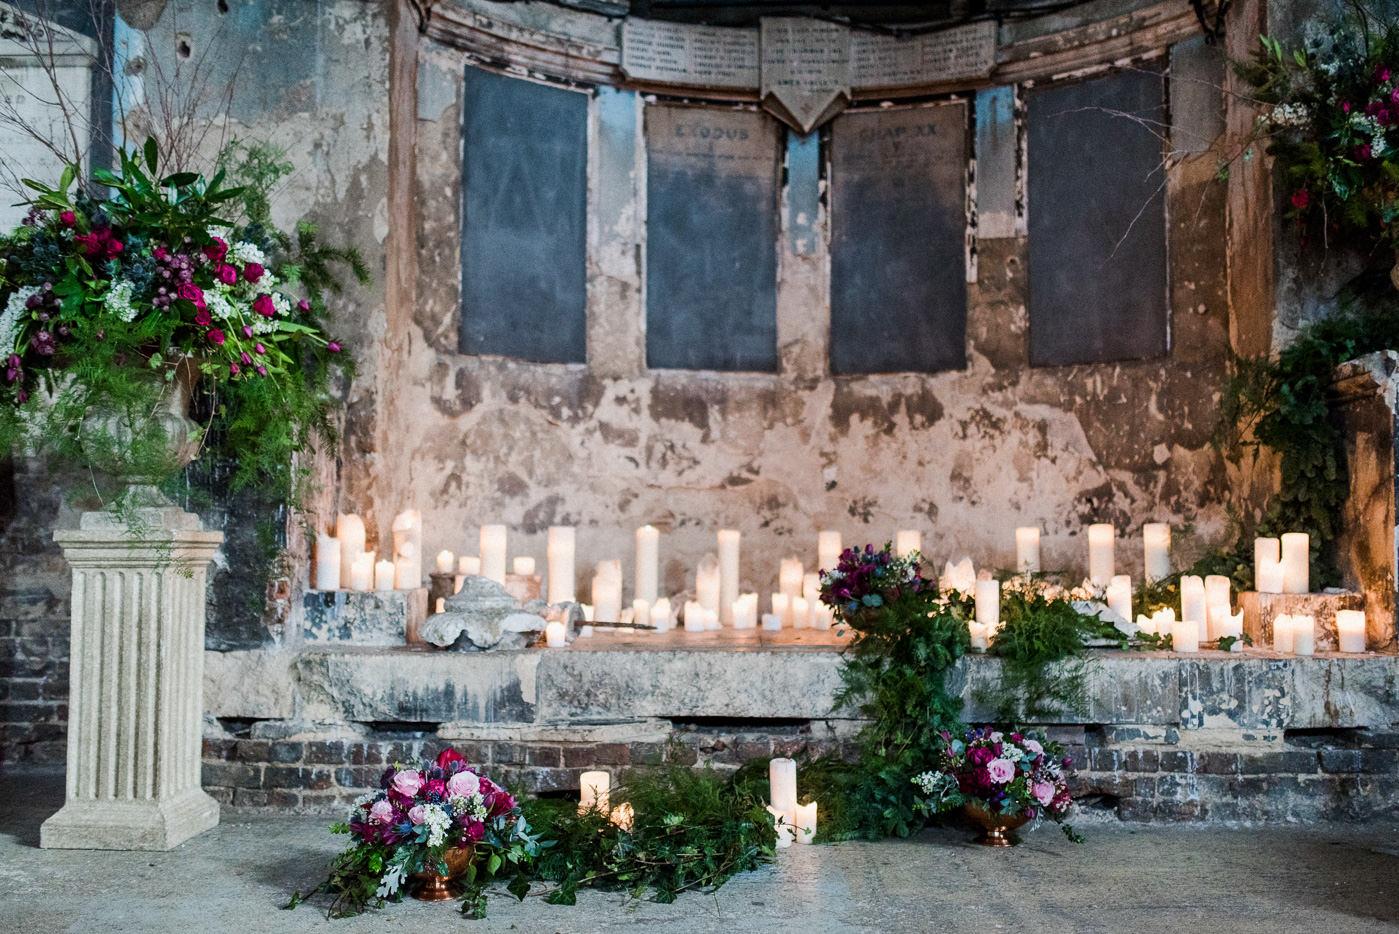 Simon Nickel Design asylum chapel wedding